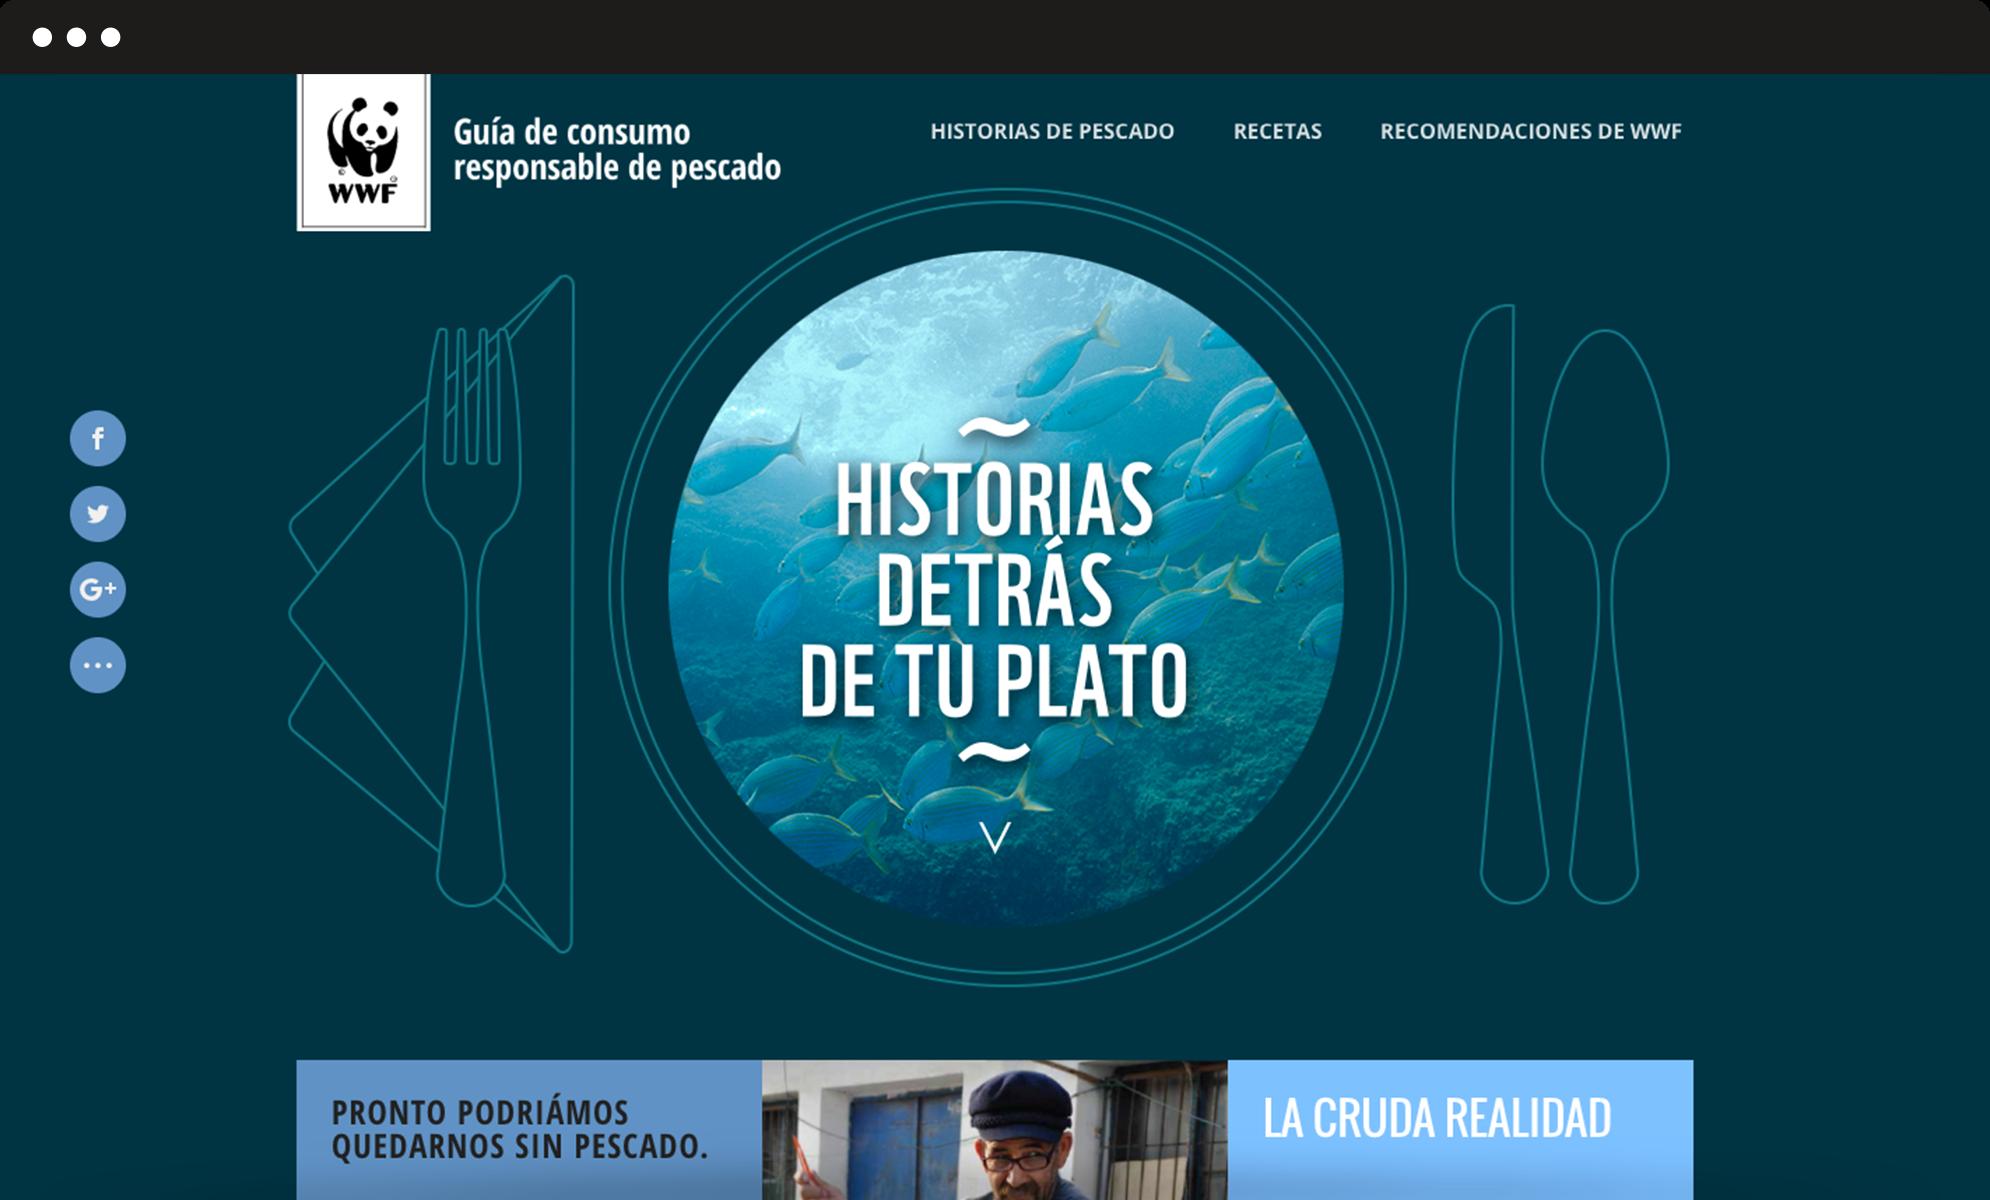 image wwf website sea food guide